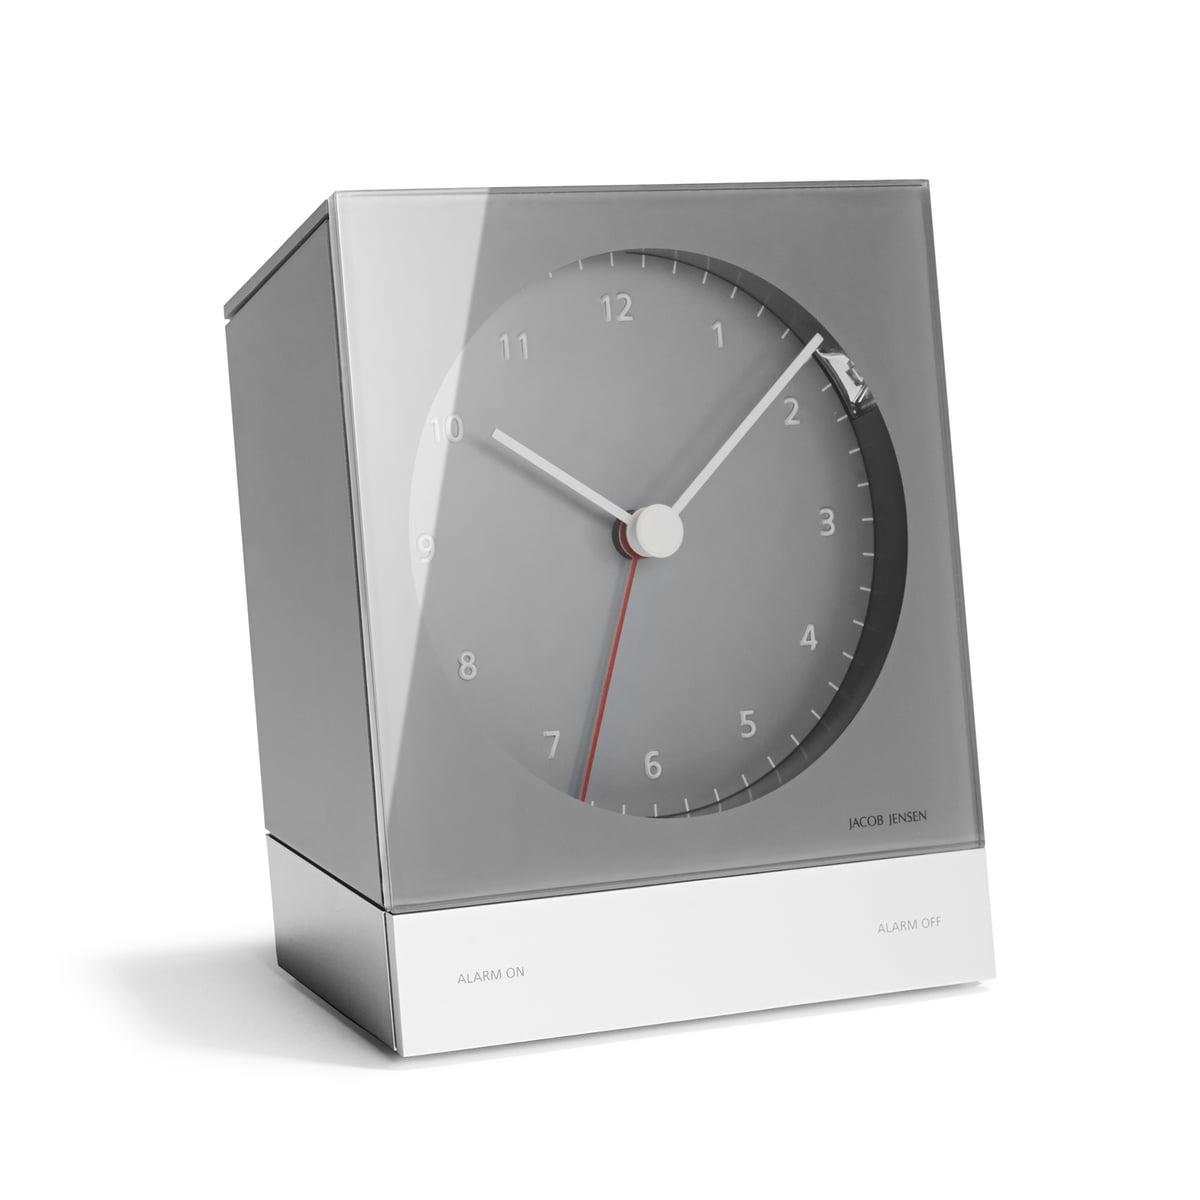 Jacob Jensen - Quartzwecker, grau | Dekoration > Uhren > Wecker | Grau | Abs-kunststoff -  aluminium | Jacob Jensen